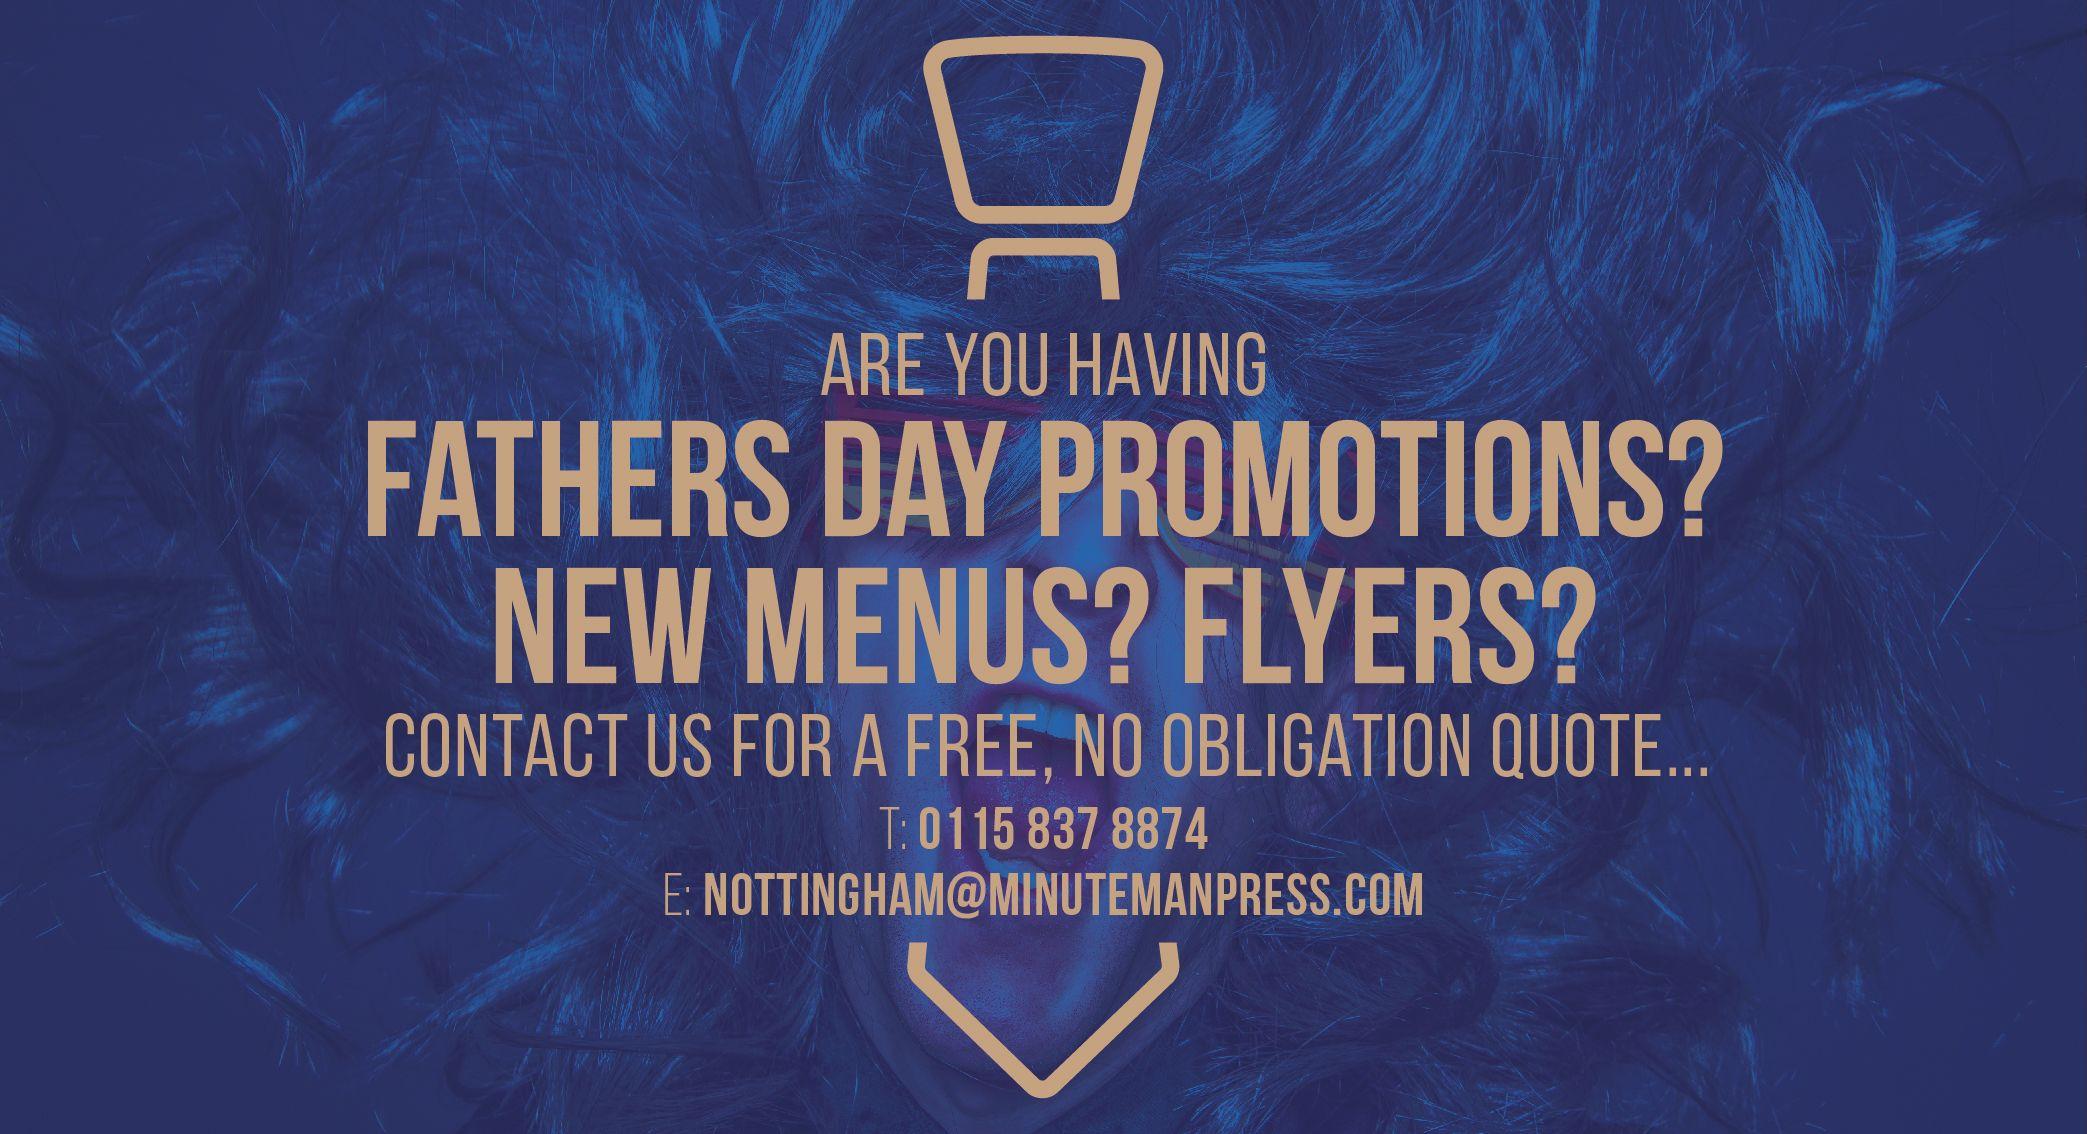 Poster design nottingham -  Fathersday Promotions Print Design Menus Flyers Minutemanpres Nottingham